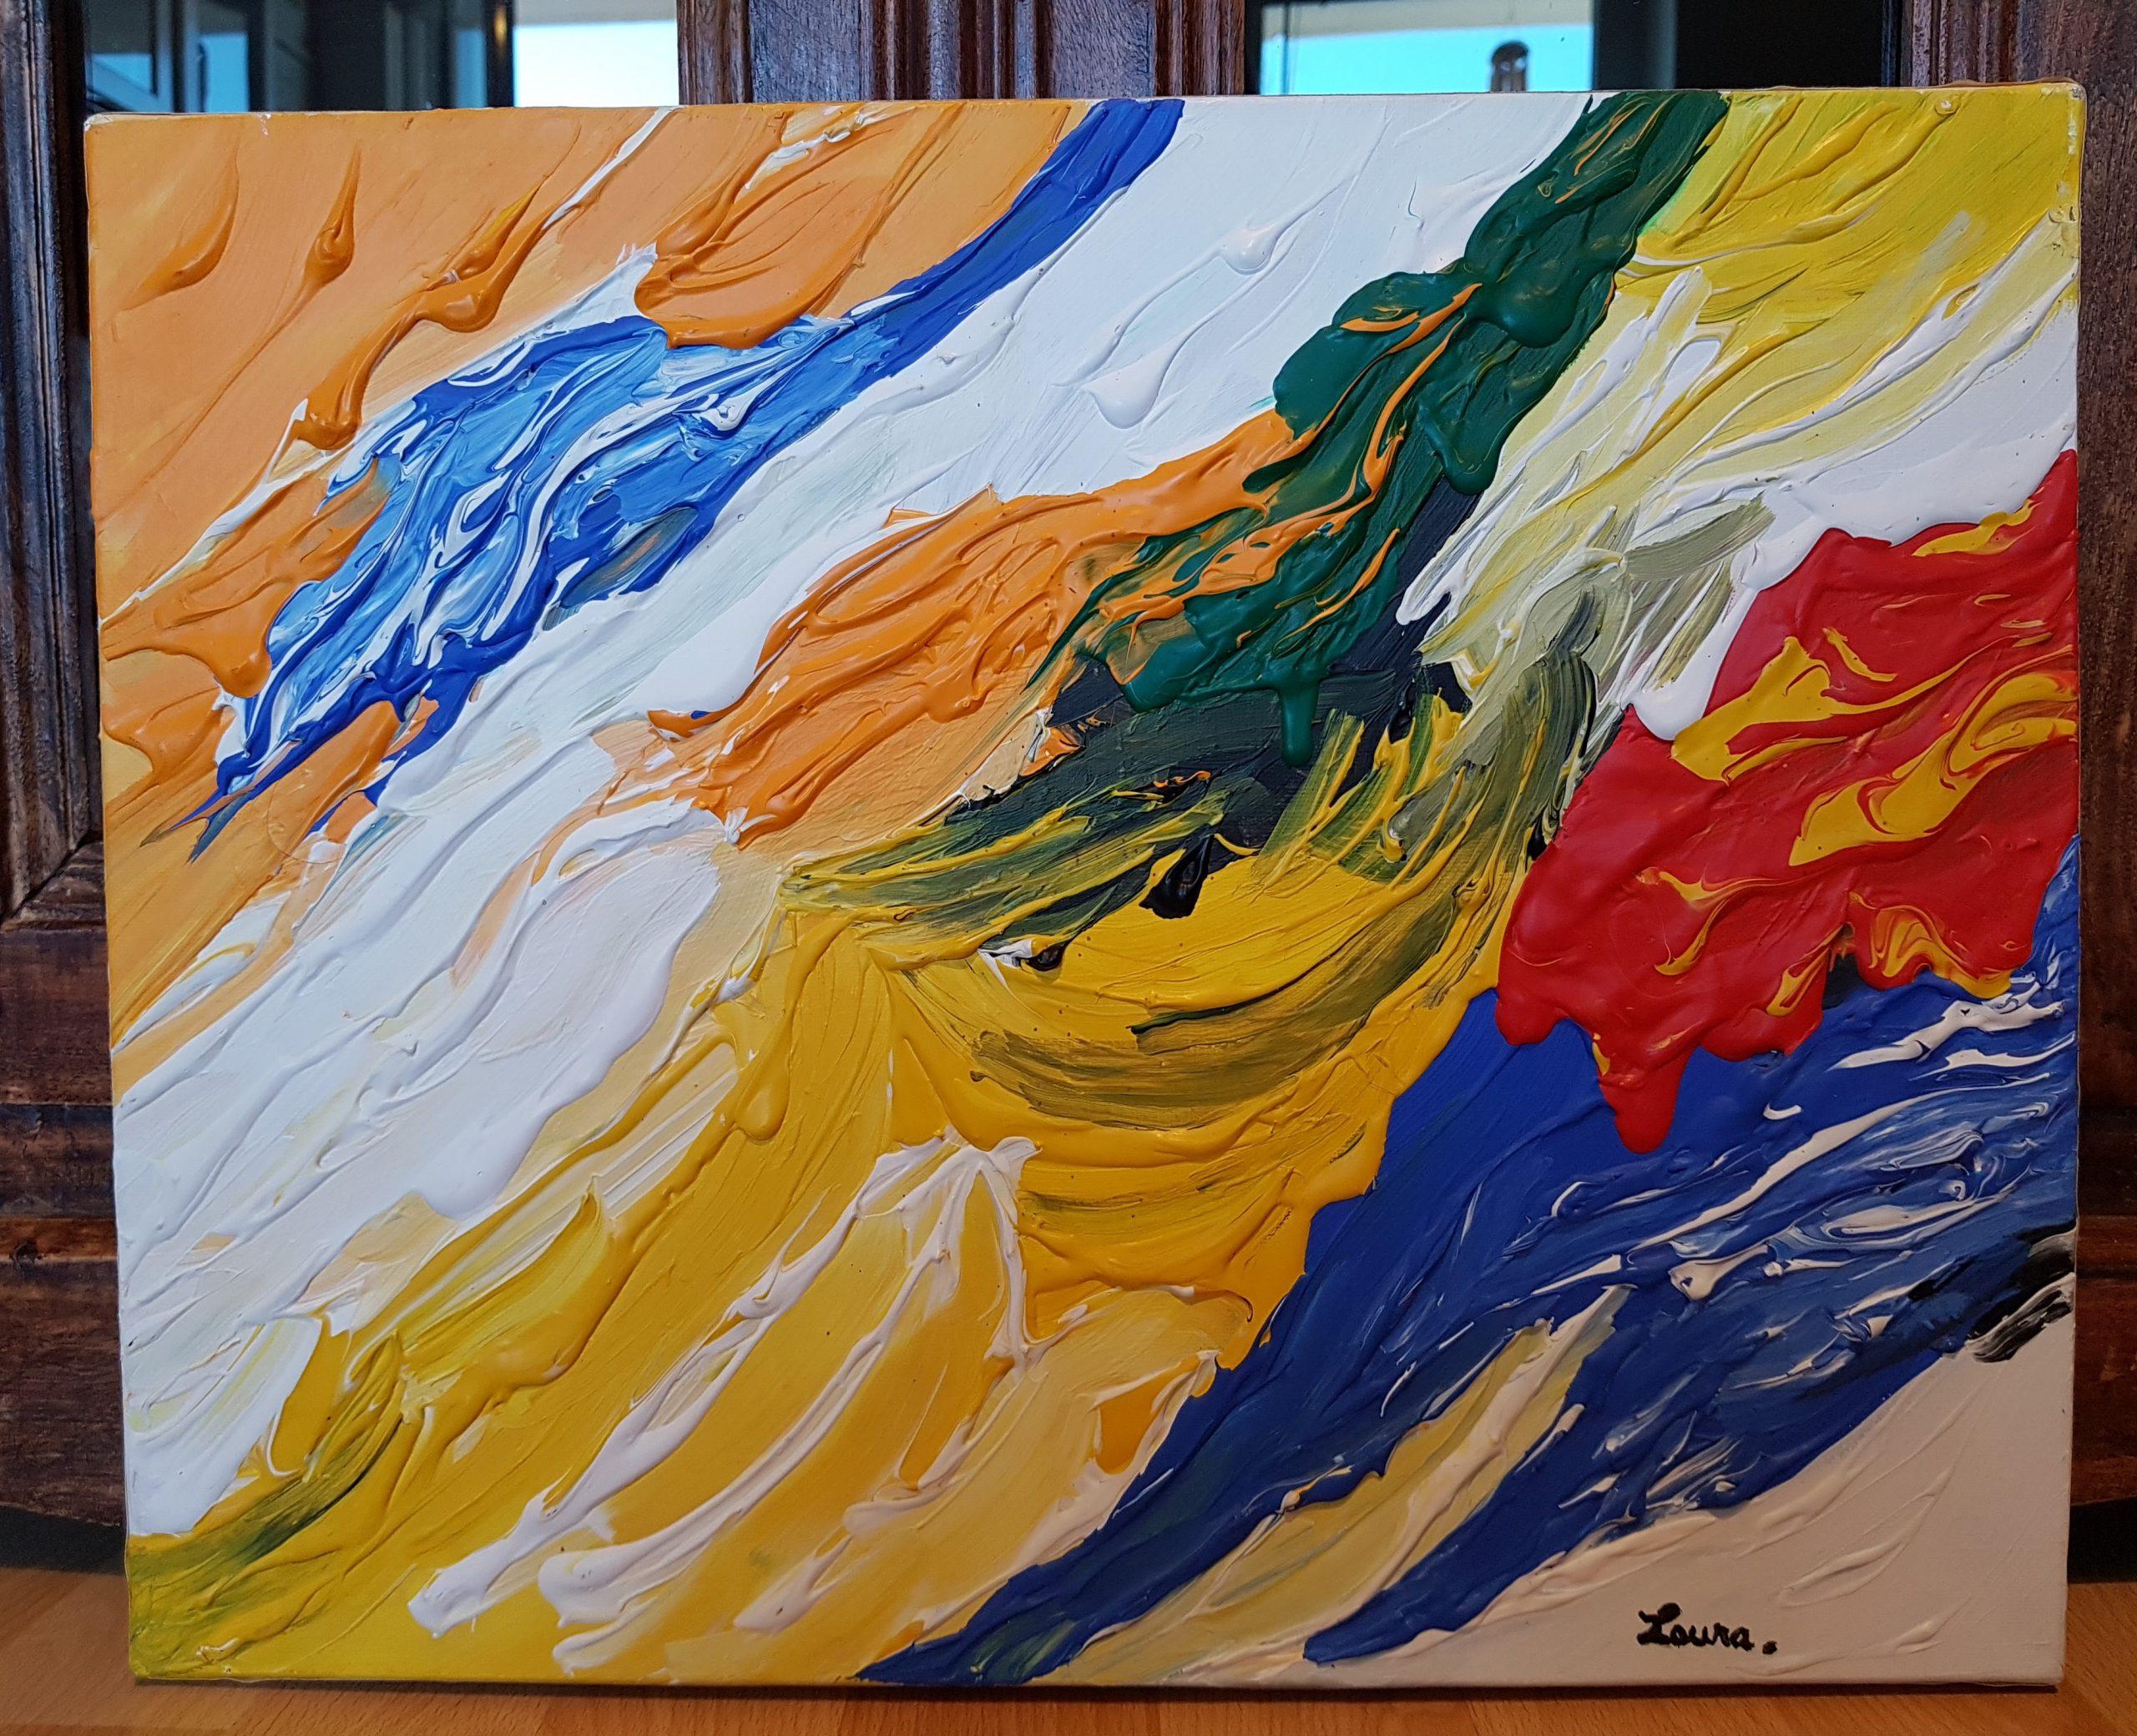 Farben-Spiel-Lebendig_ca. 41 x 33 cm